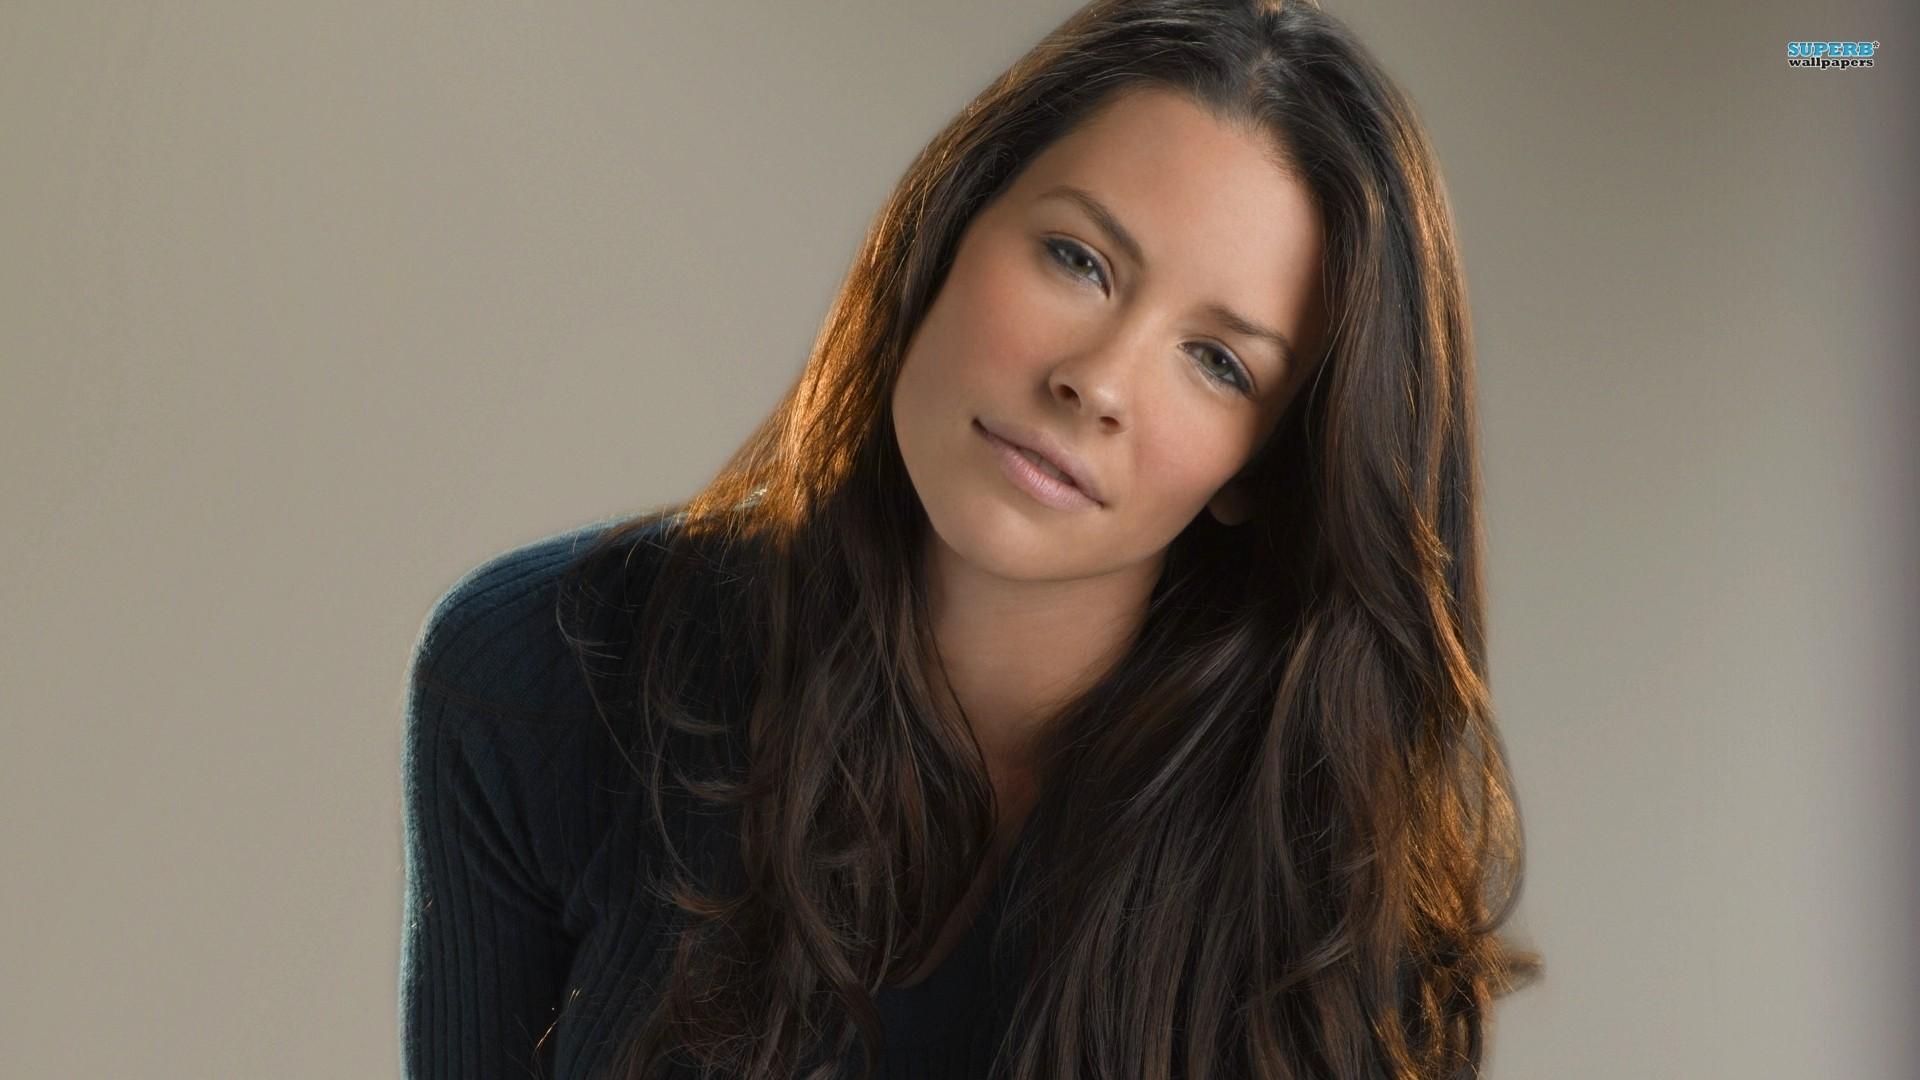 Evangeline Lilly Photos